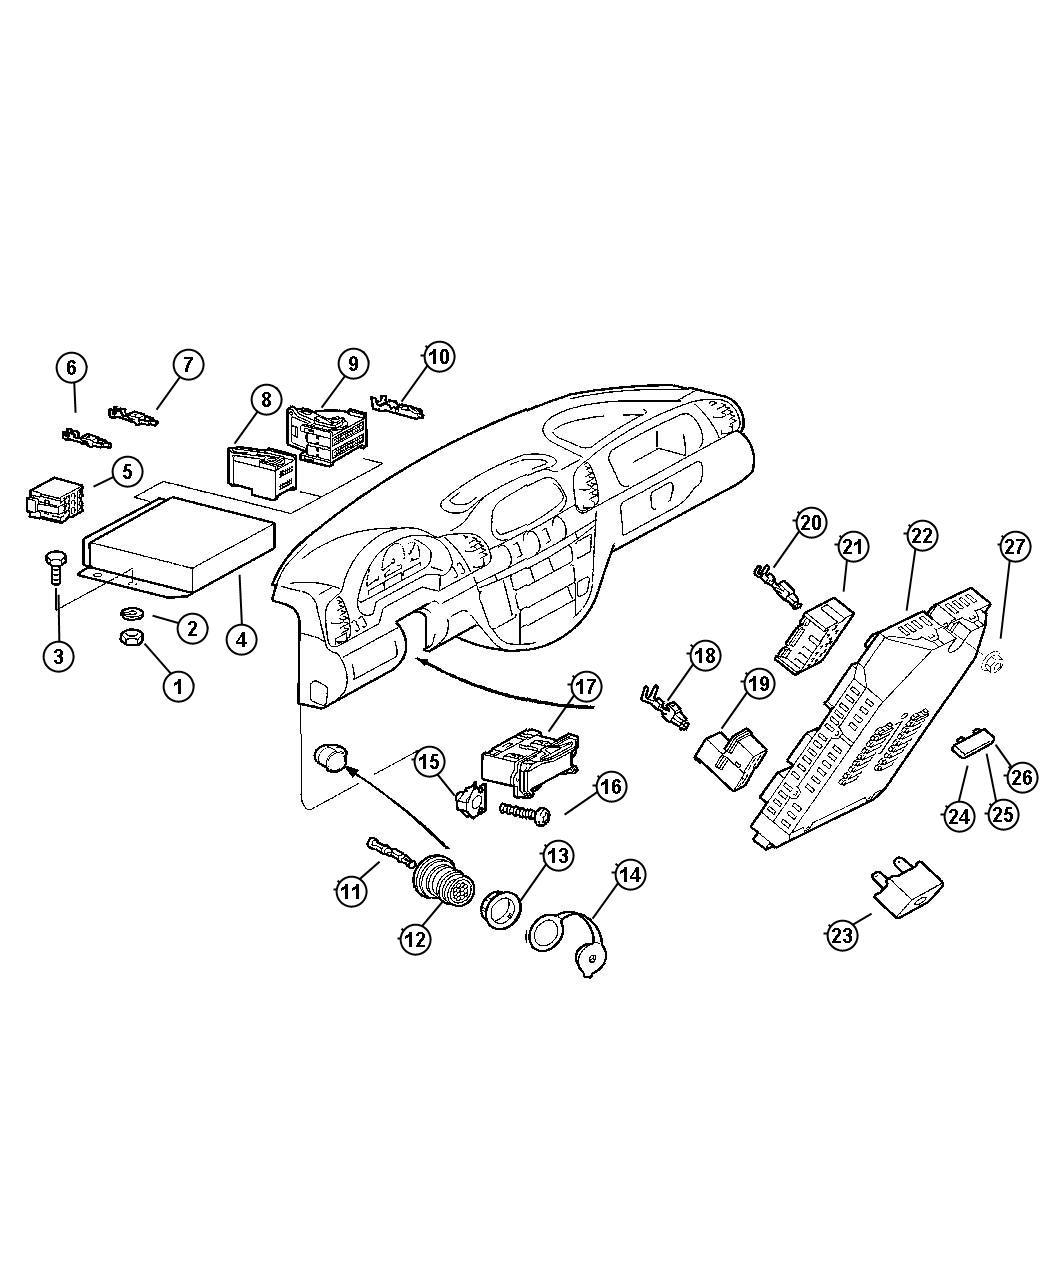 2013 Dodge Journey Fuse. Standard. Back of radio. Modules